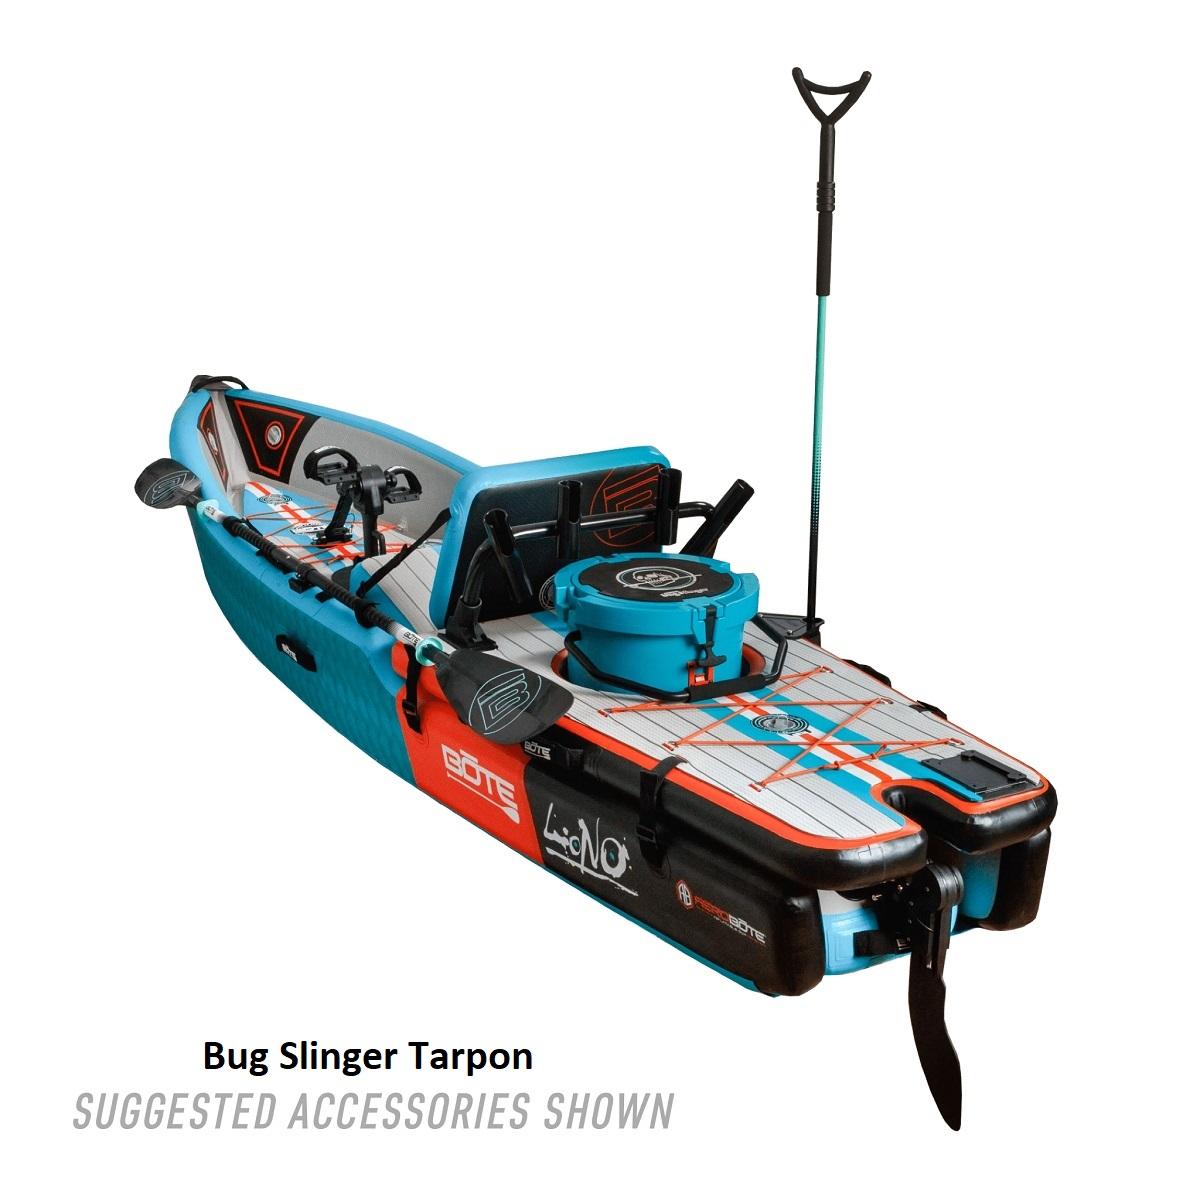 BOTE Lono Inflatable Kayak - Bug Slinger Tarpon 2